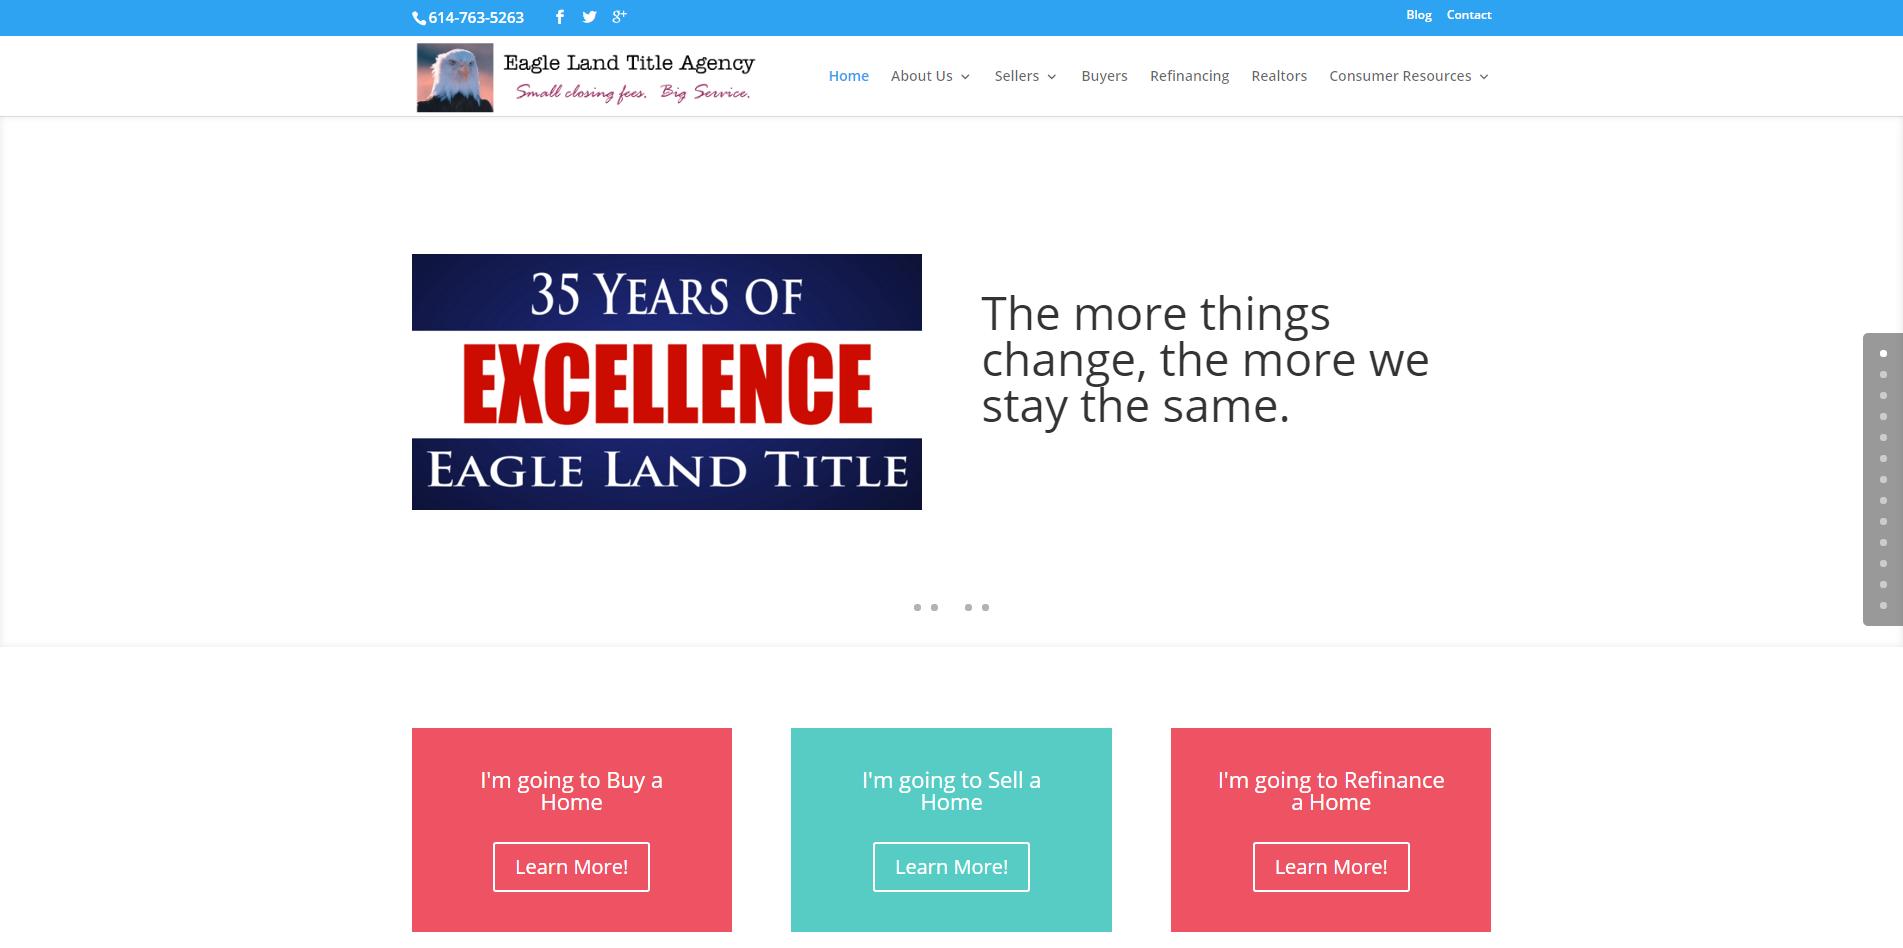 Eagle Land Title Agency